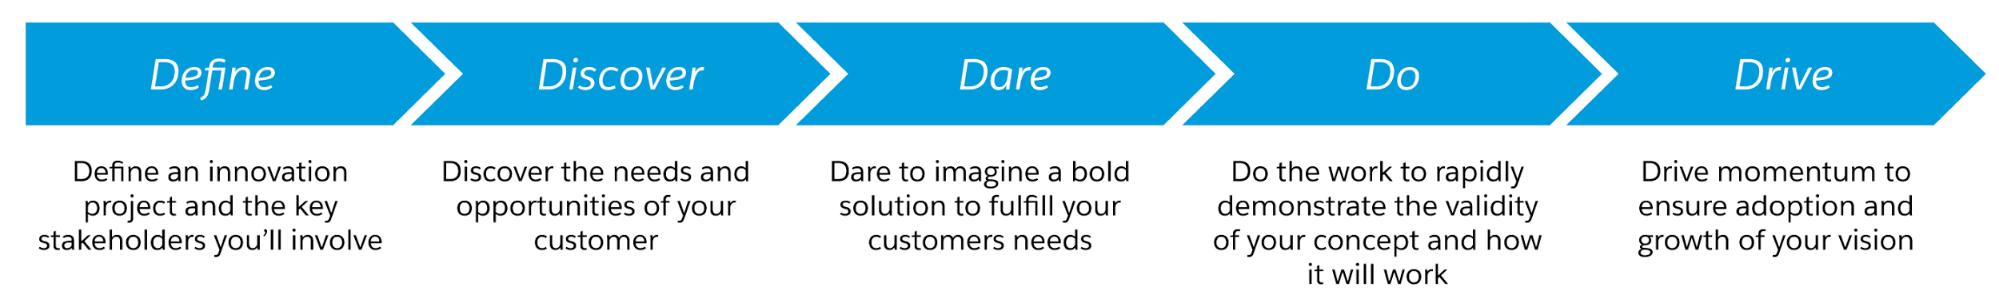 Flowchart: Define, Discover, Dare, Do, Drive